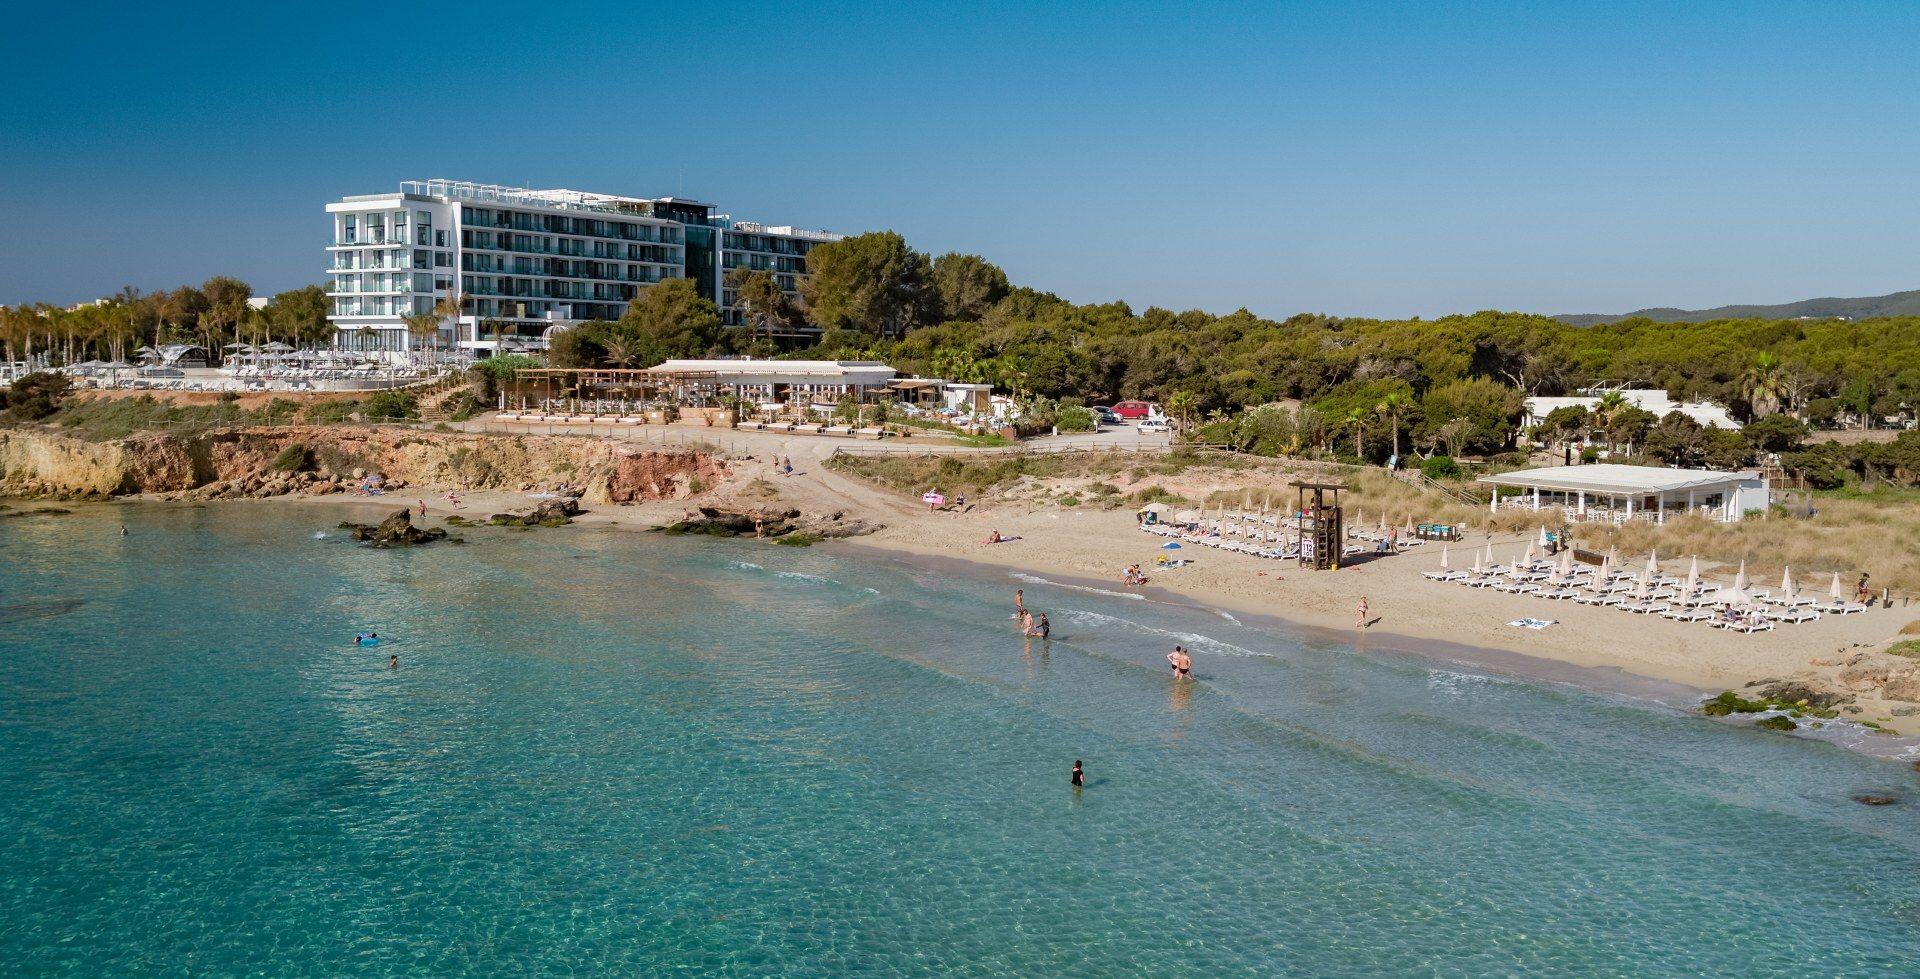 Bless Hotel Ibiza, Atzaró Beach y Atzaró Chiringuito. Playa de Cala Nova, Ibiza